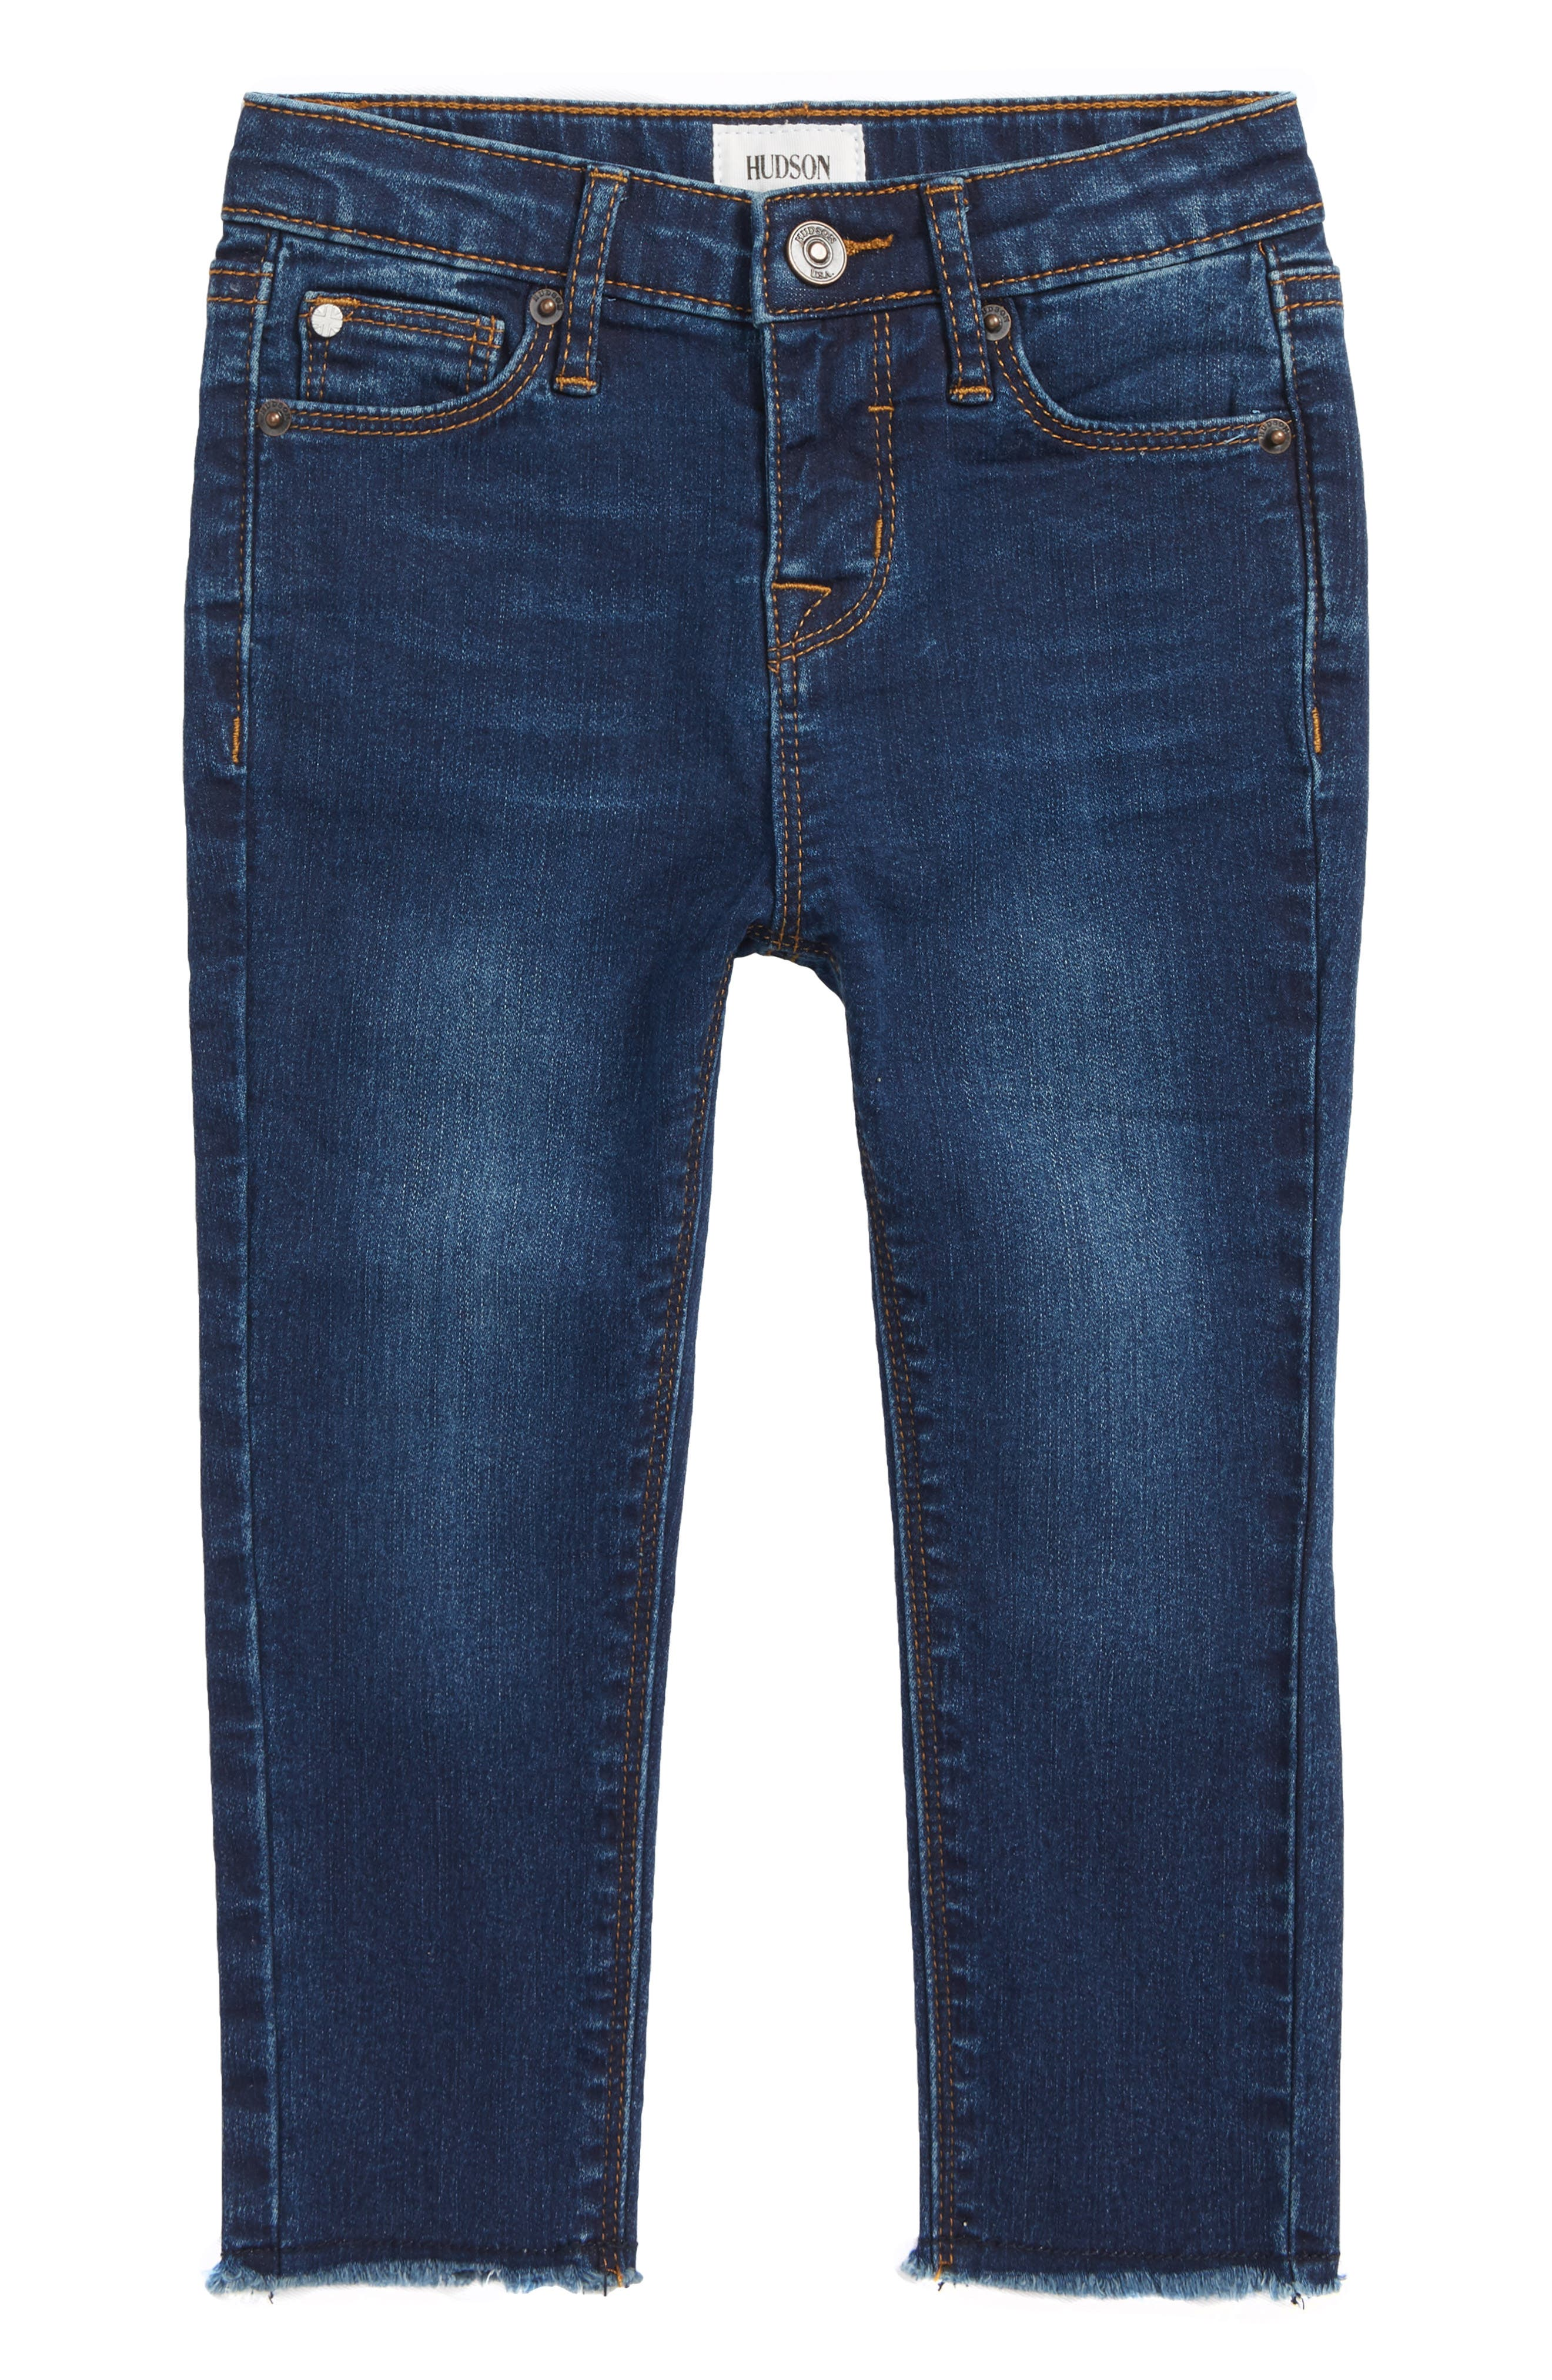 Calin Pull-On Skinny Jeans,                             Main thumbnail 1, color,                             BDT-BLUE DEPTHS